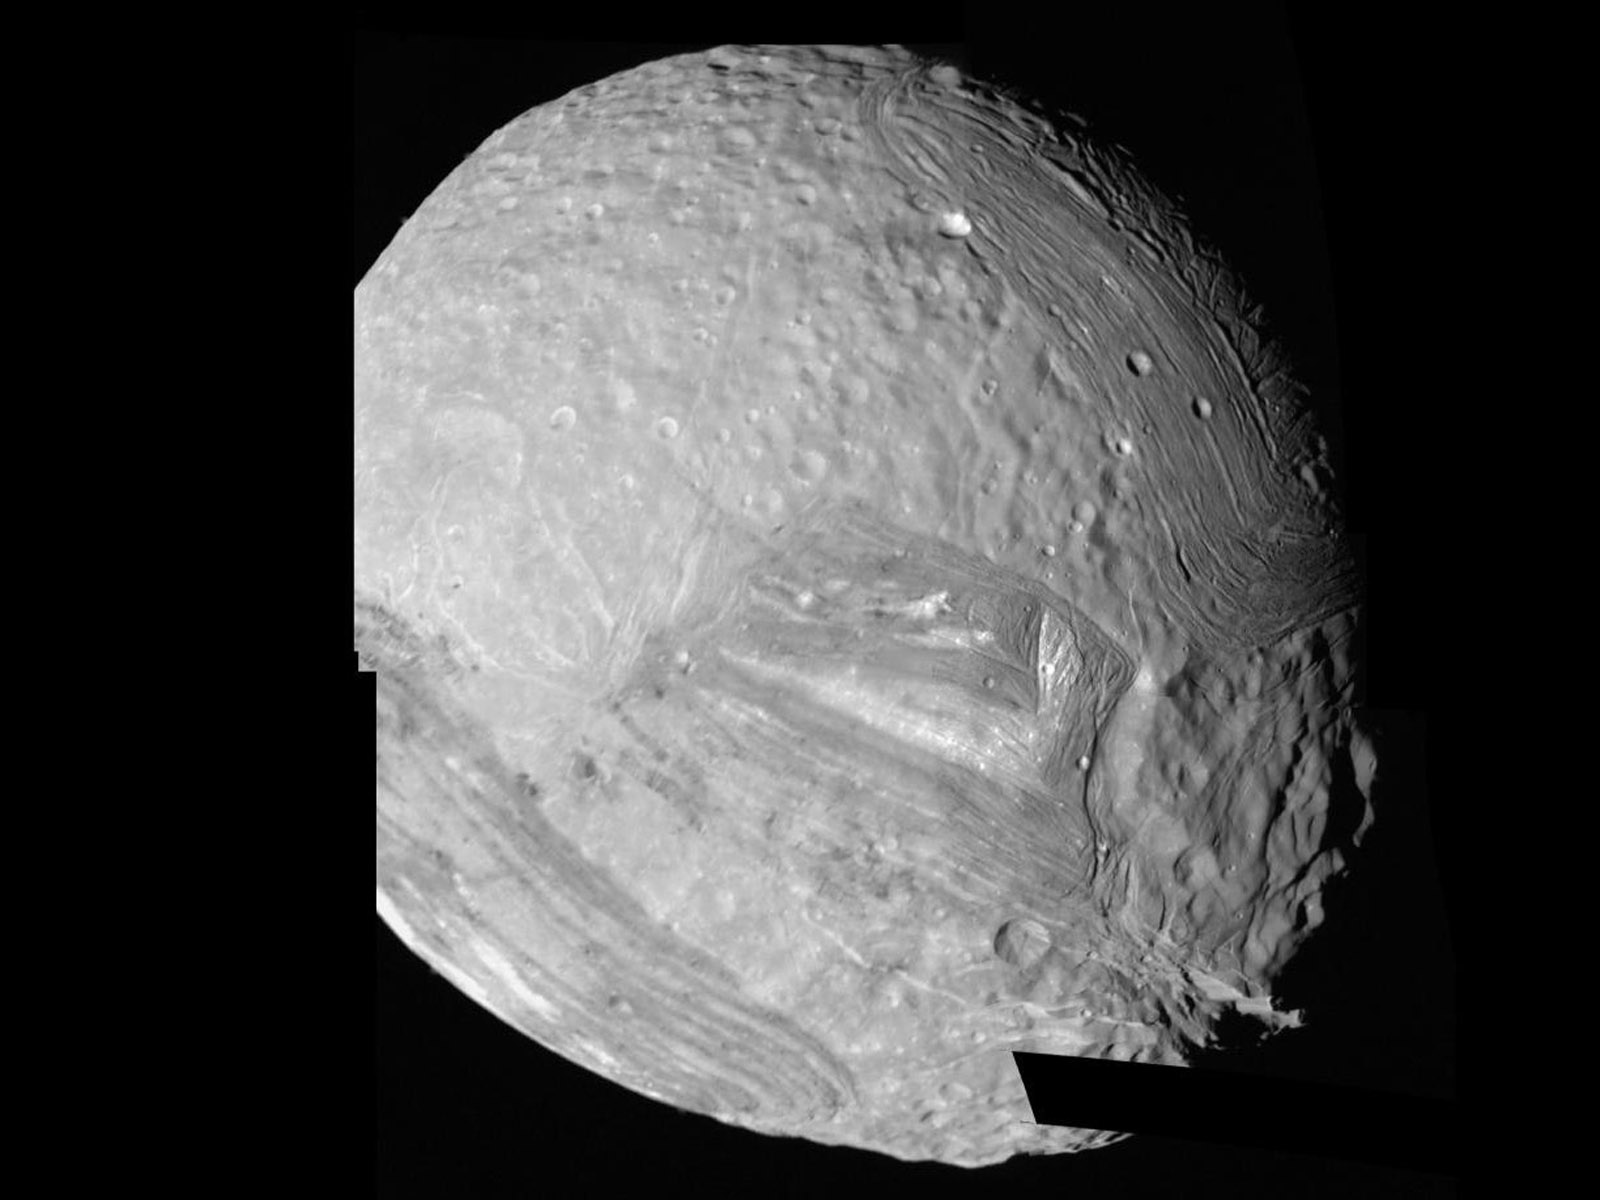 ophelia moon of uranus - photo #19